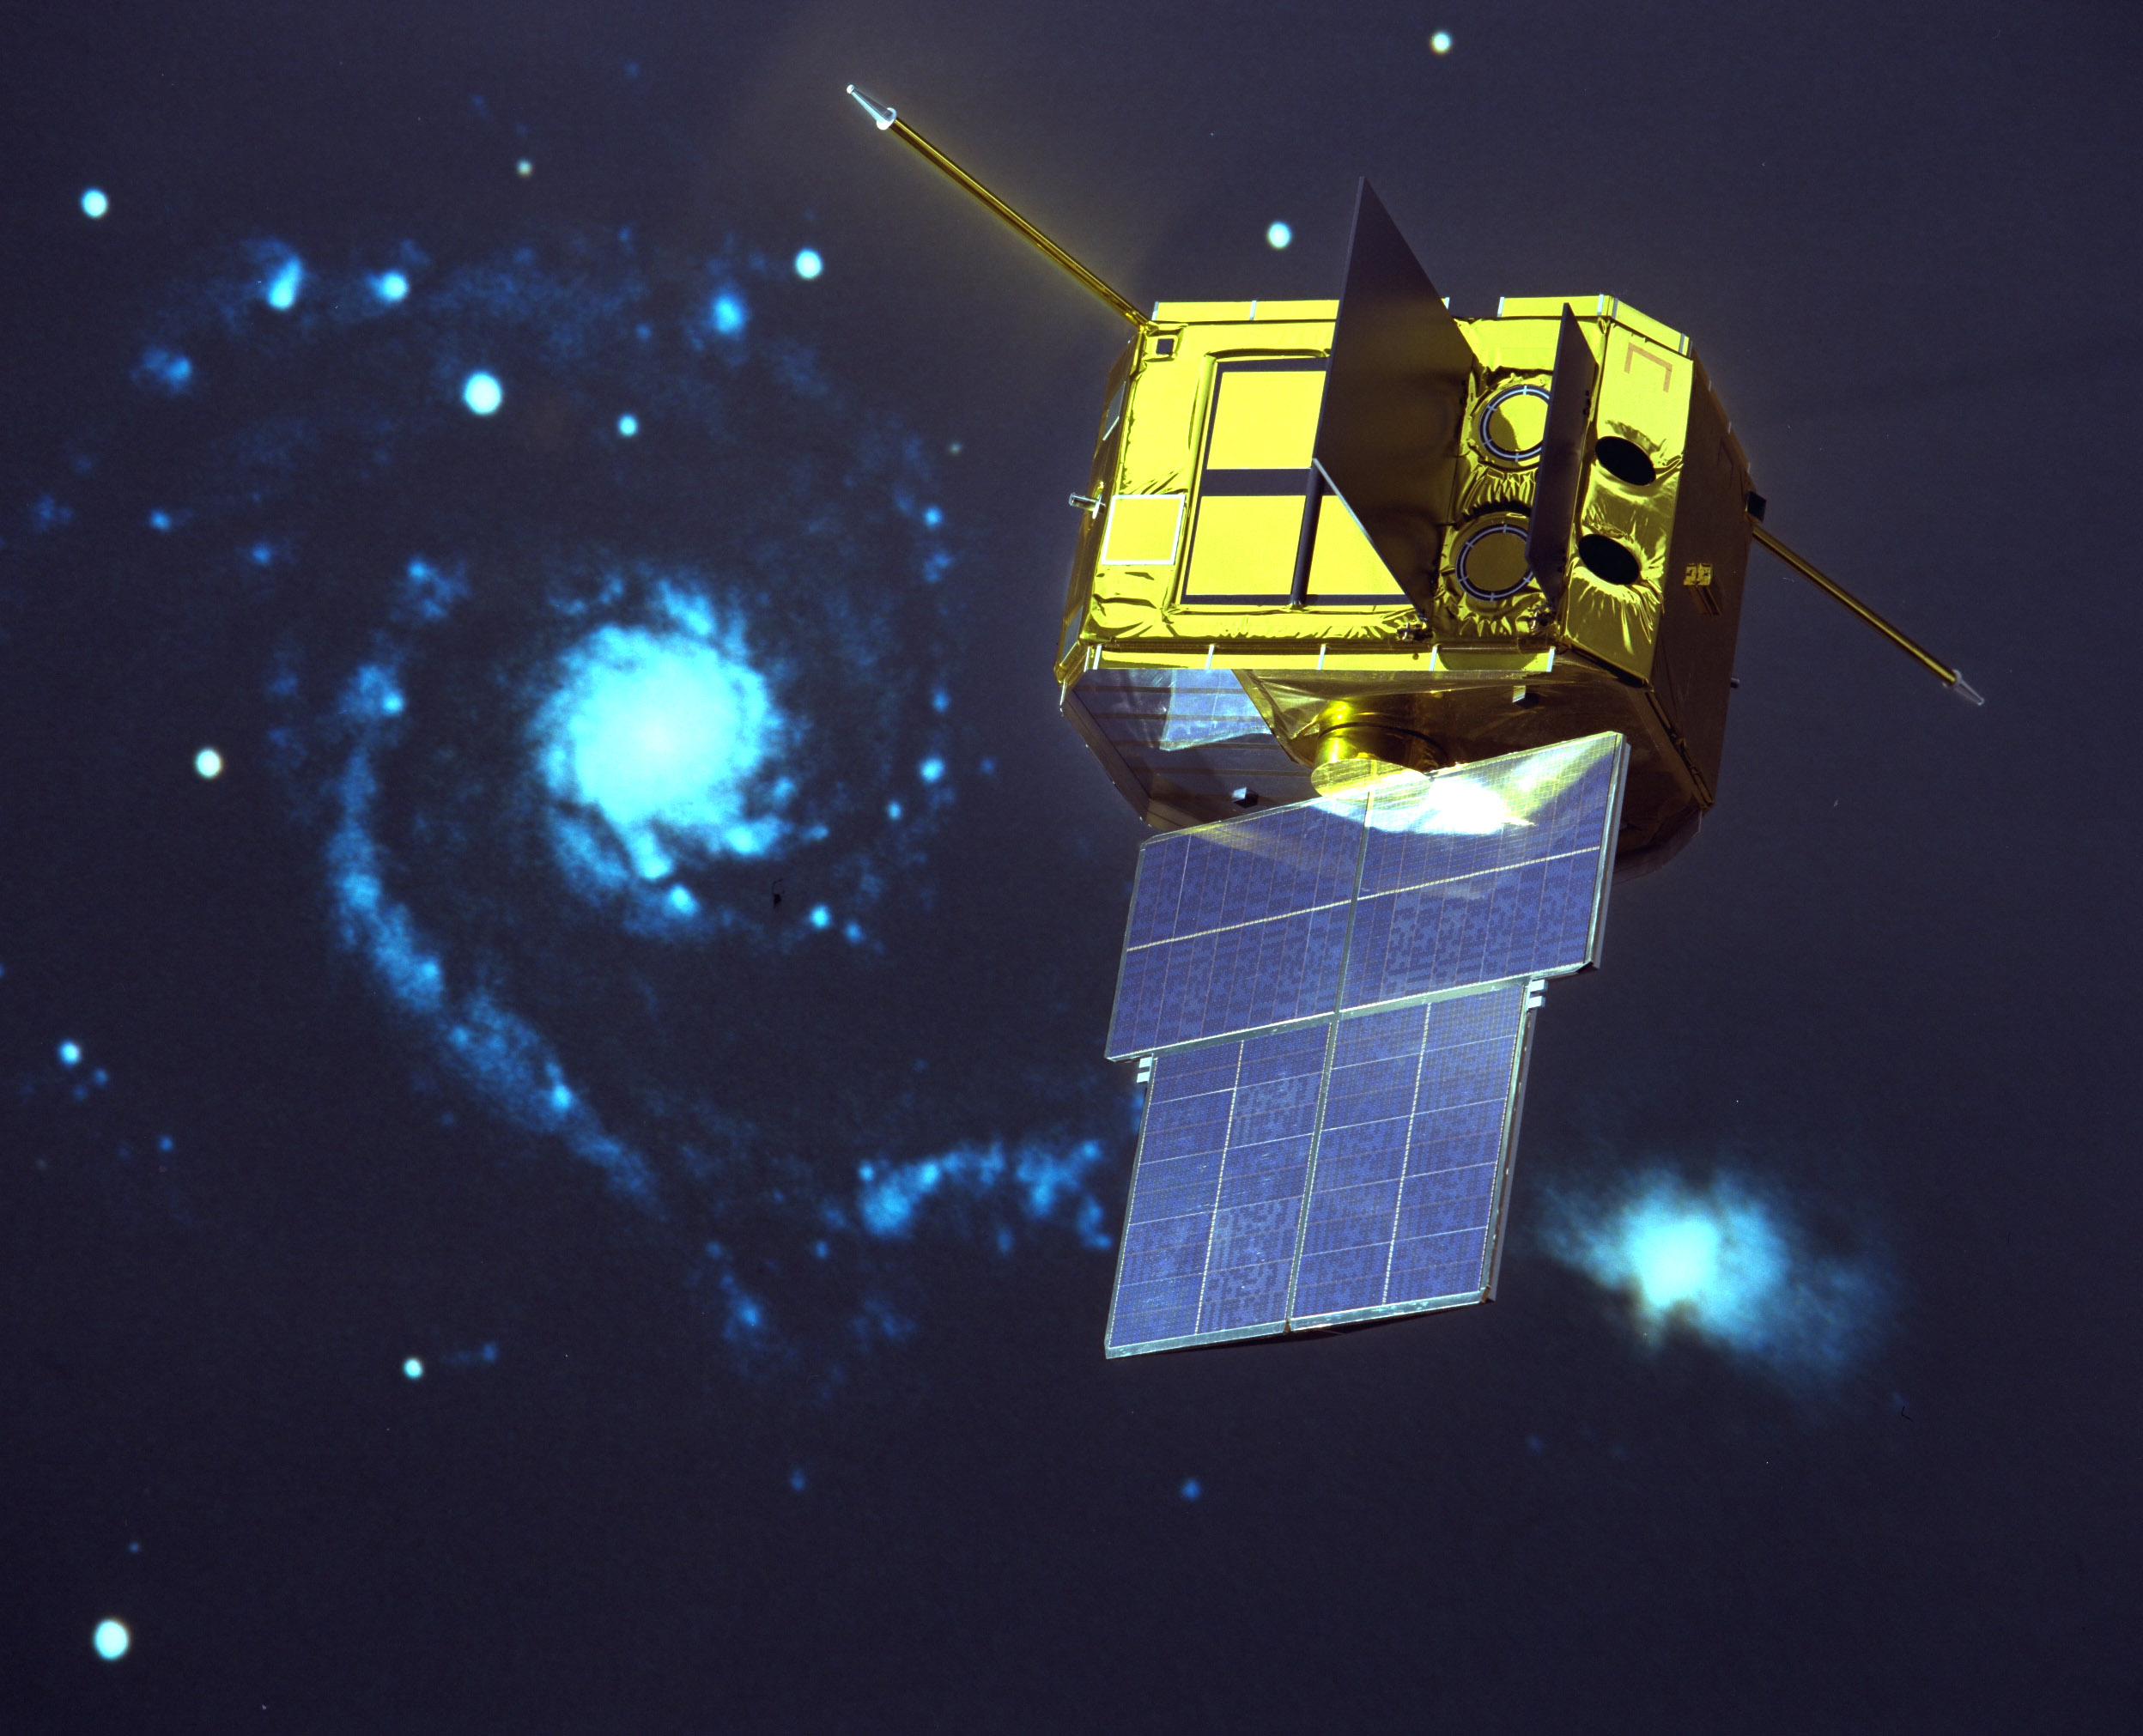 1567214320736-EXOSAT_mission.jpg